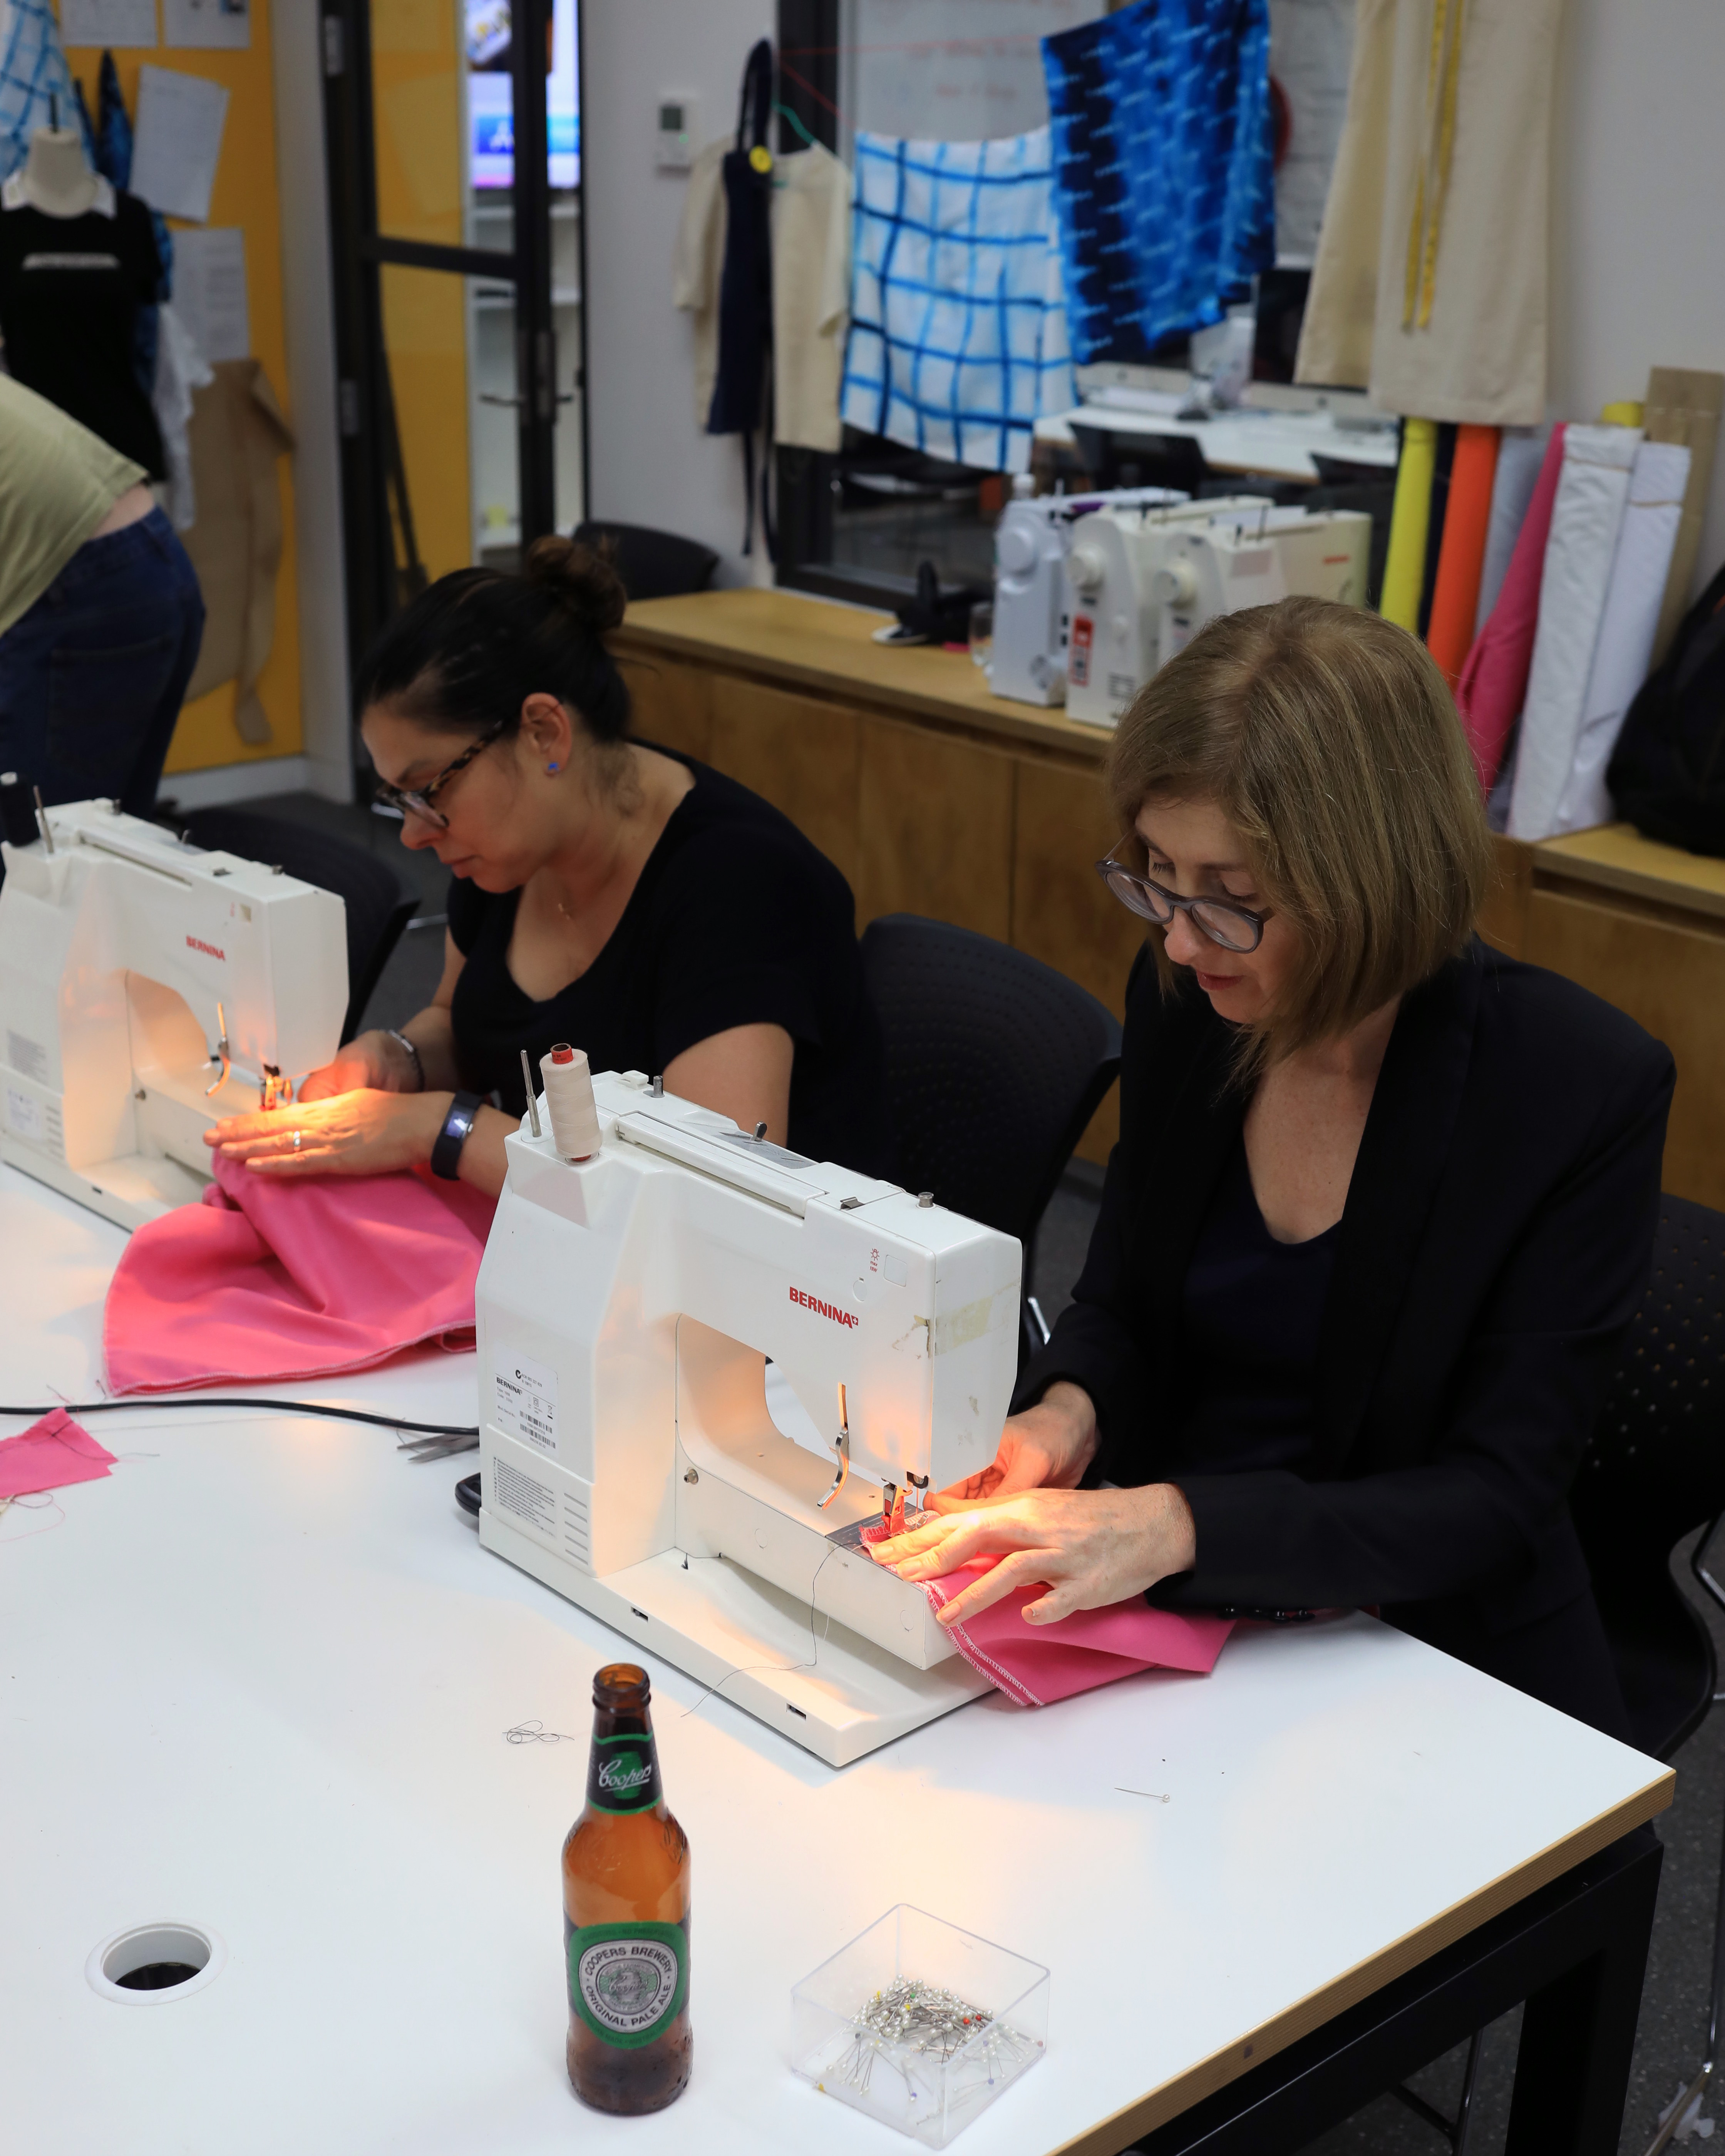 igs-community-learning-program-2019-sewing-1